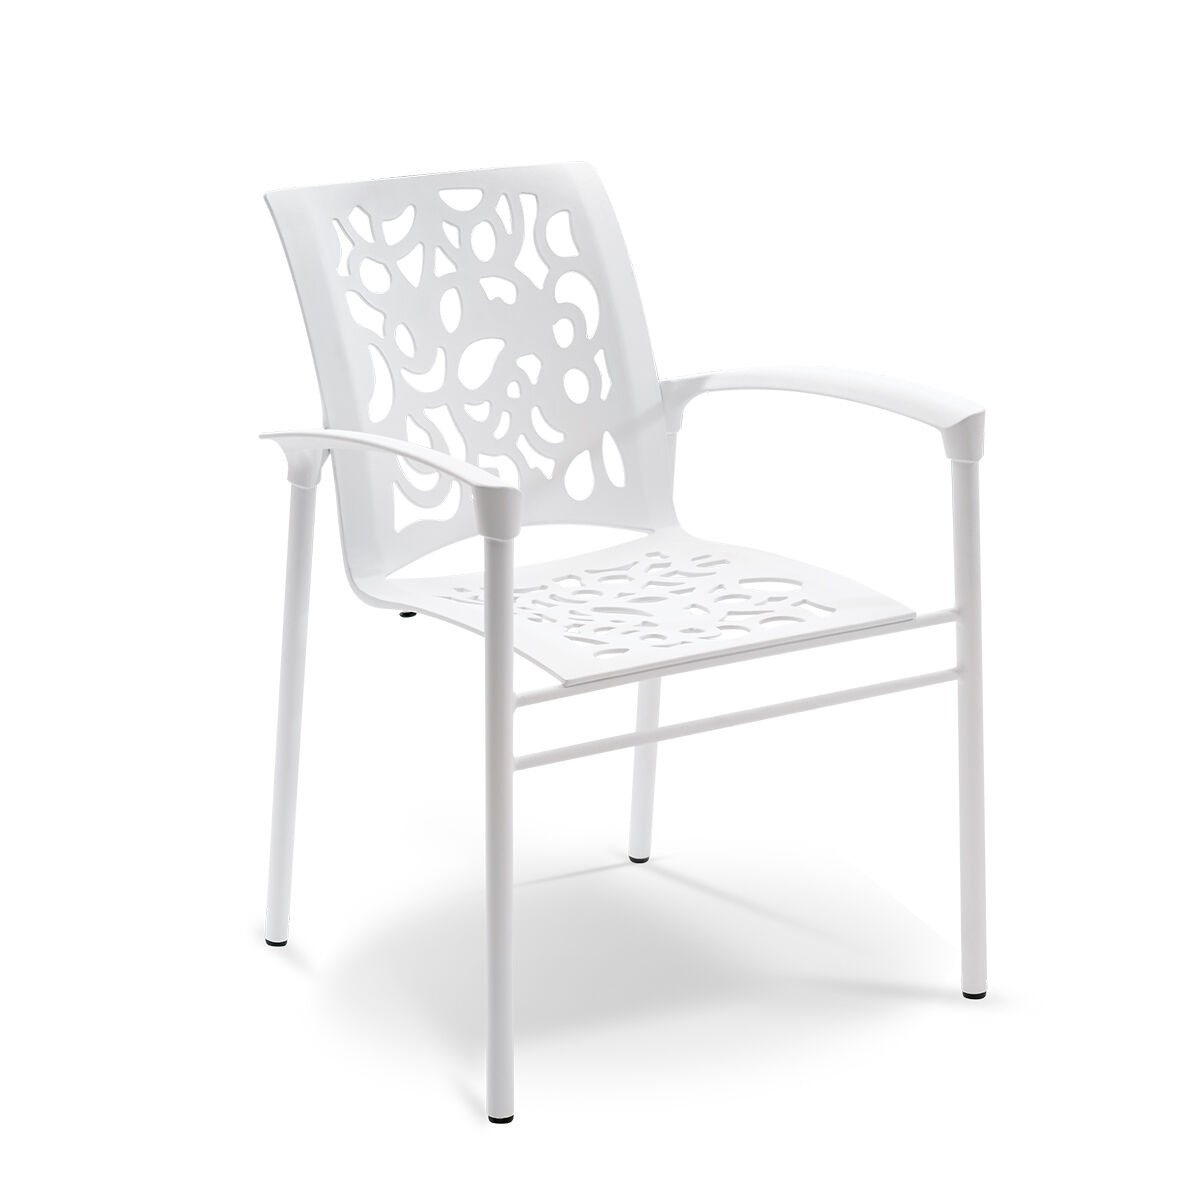 Stencil Armchair Tabletops Furniture